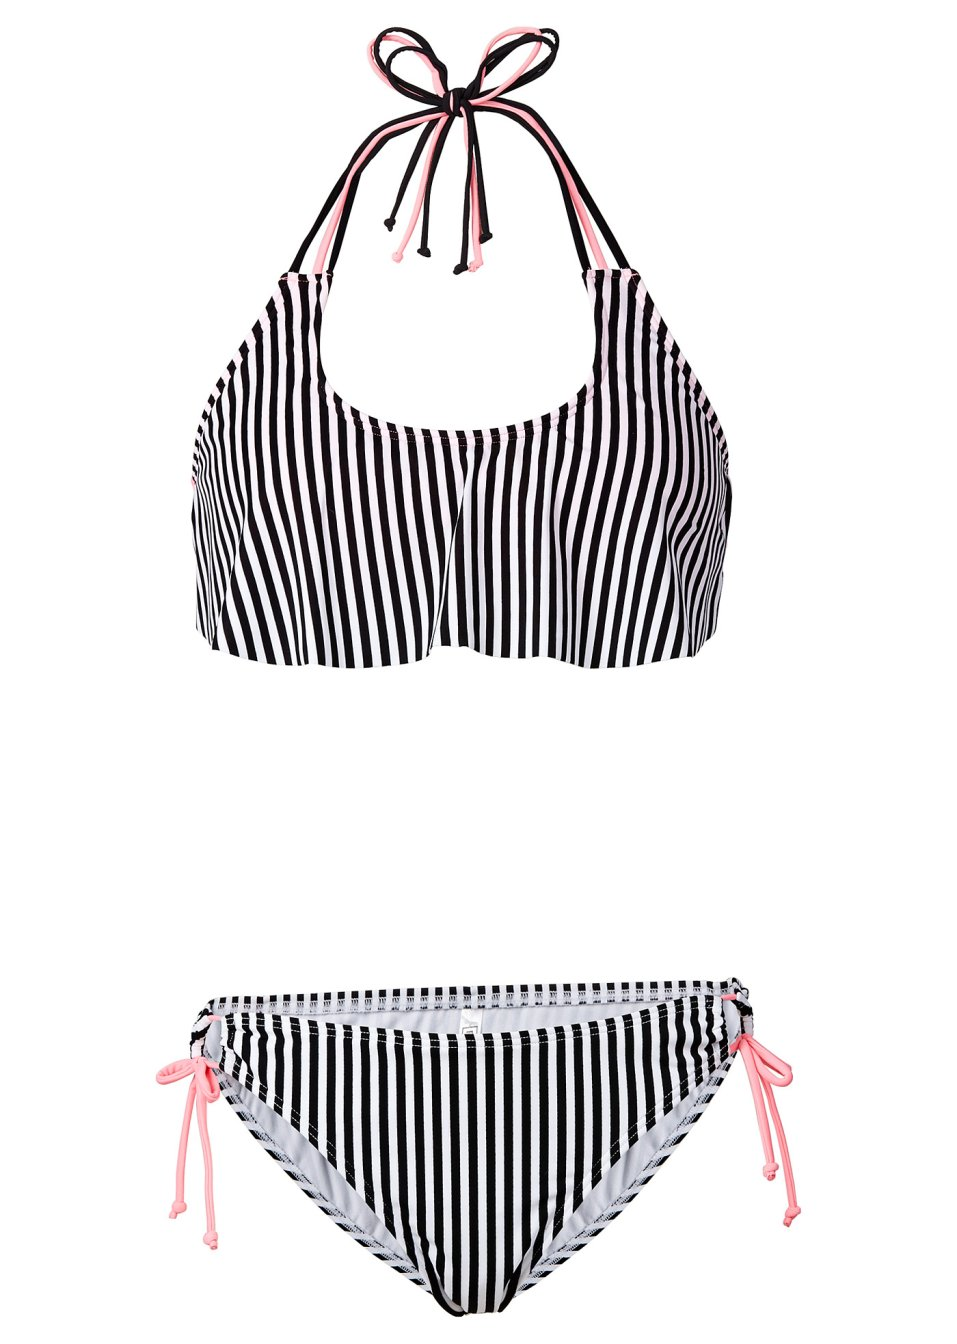 bandeau bikini mit volant 2 tlg set schwarz wei. Black Bedroom Furniture Sets. Home Design Ideas